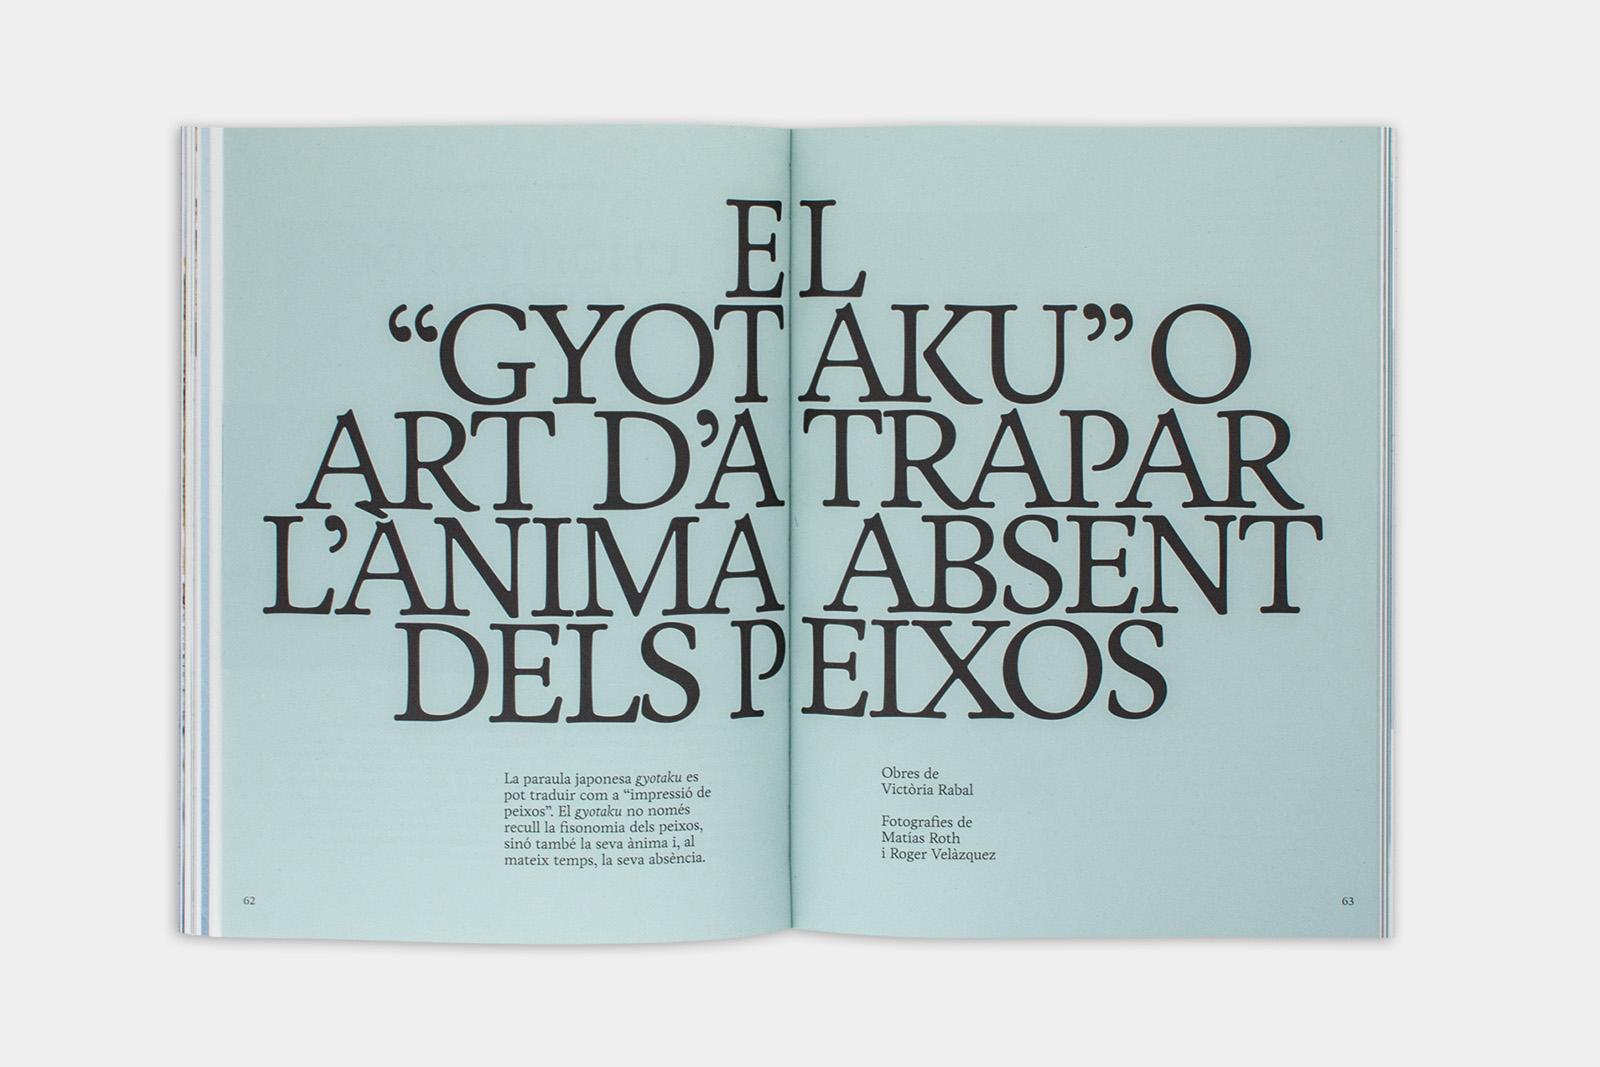 Collserola-Sabir-Gyotaku